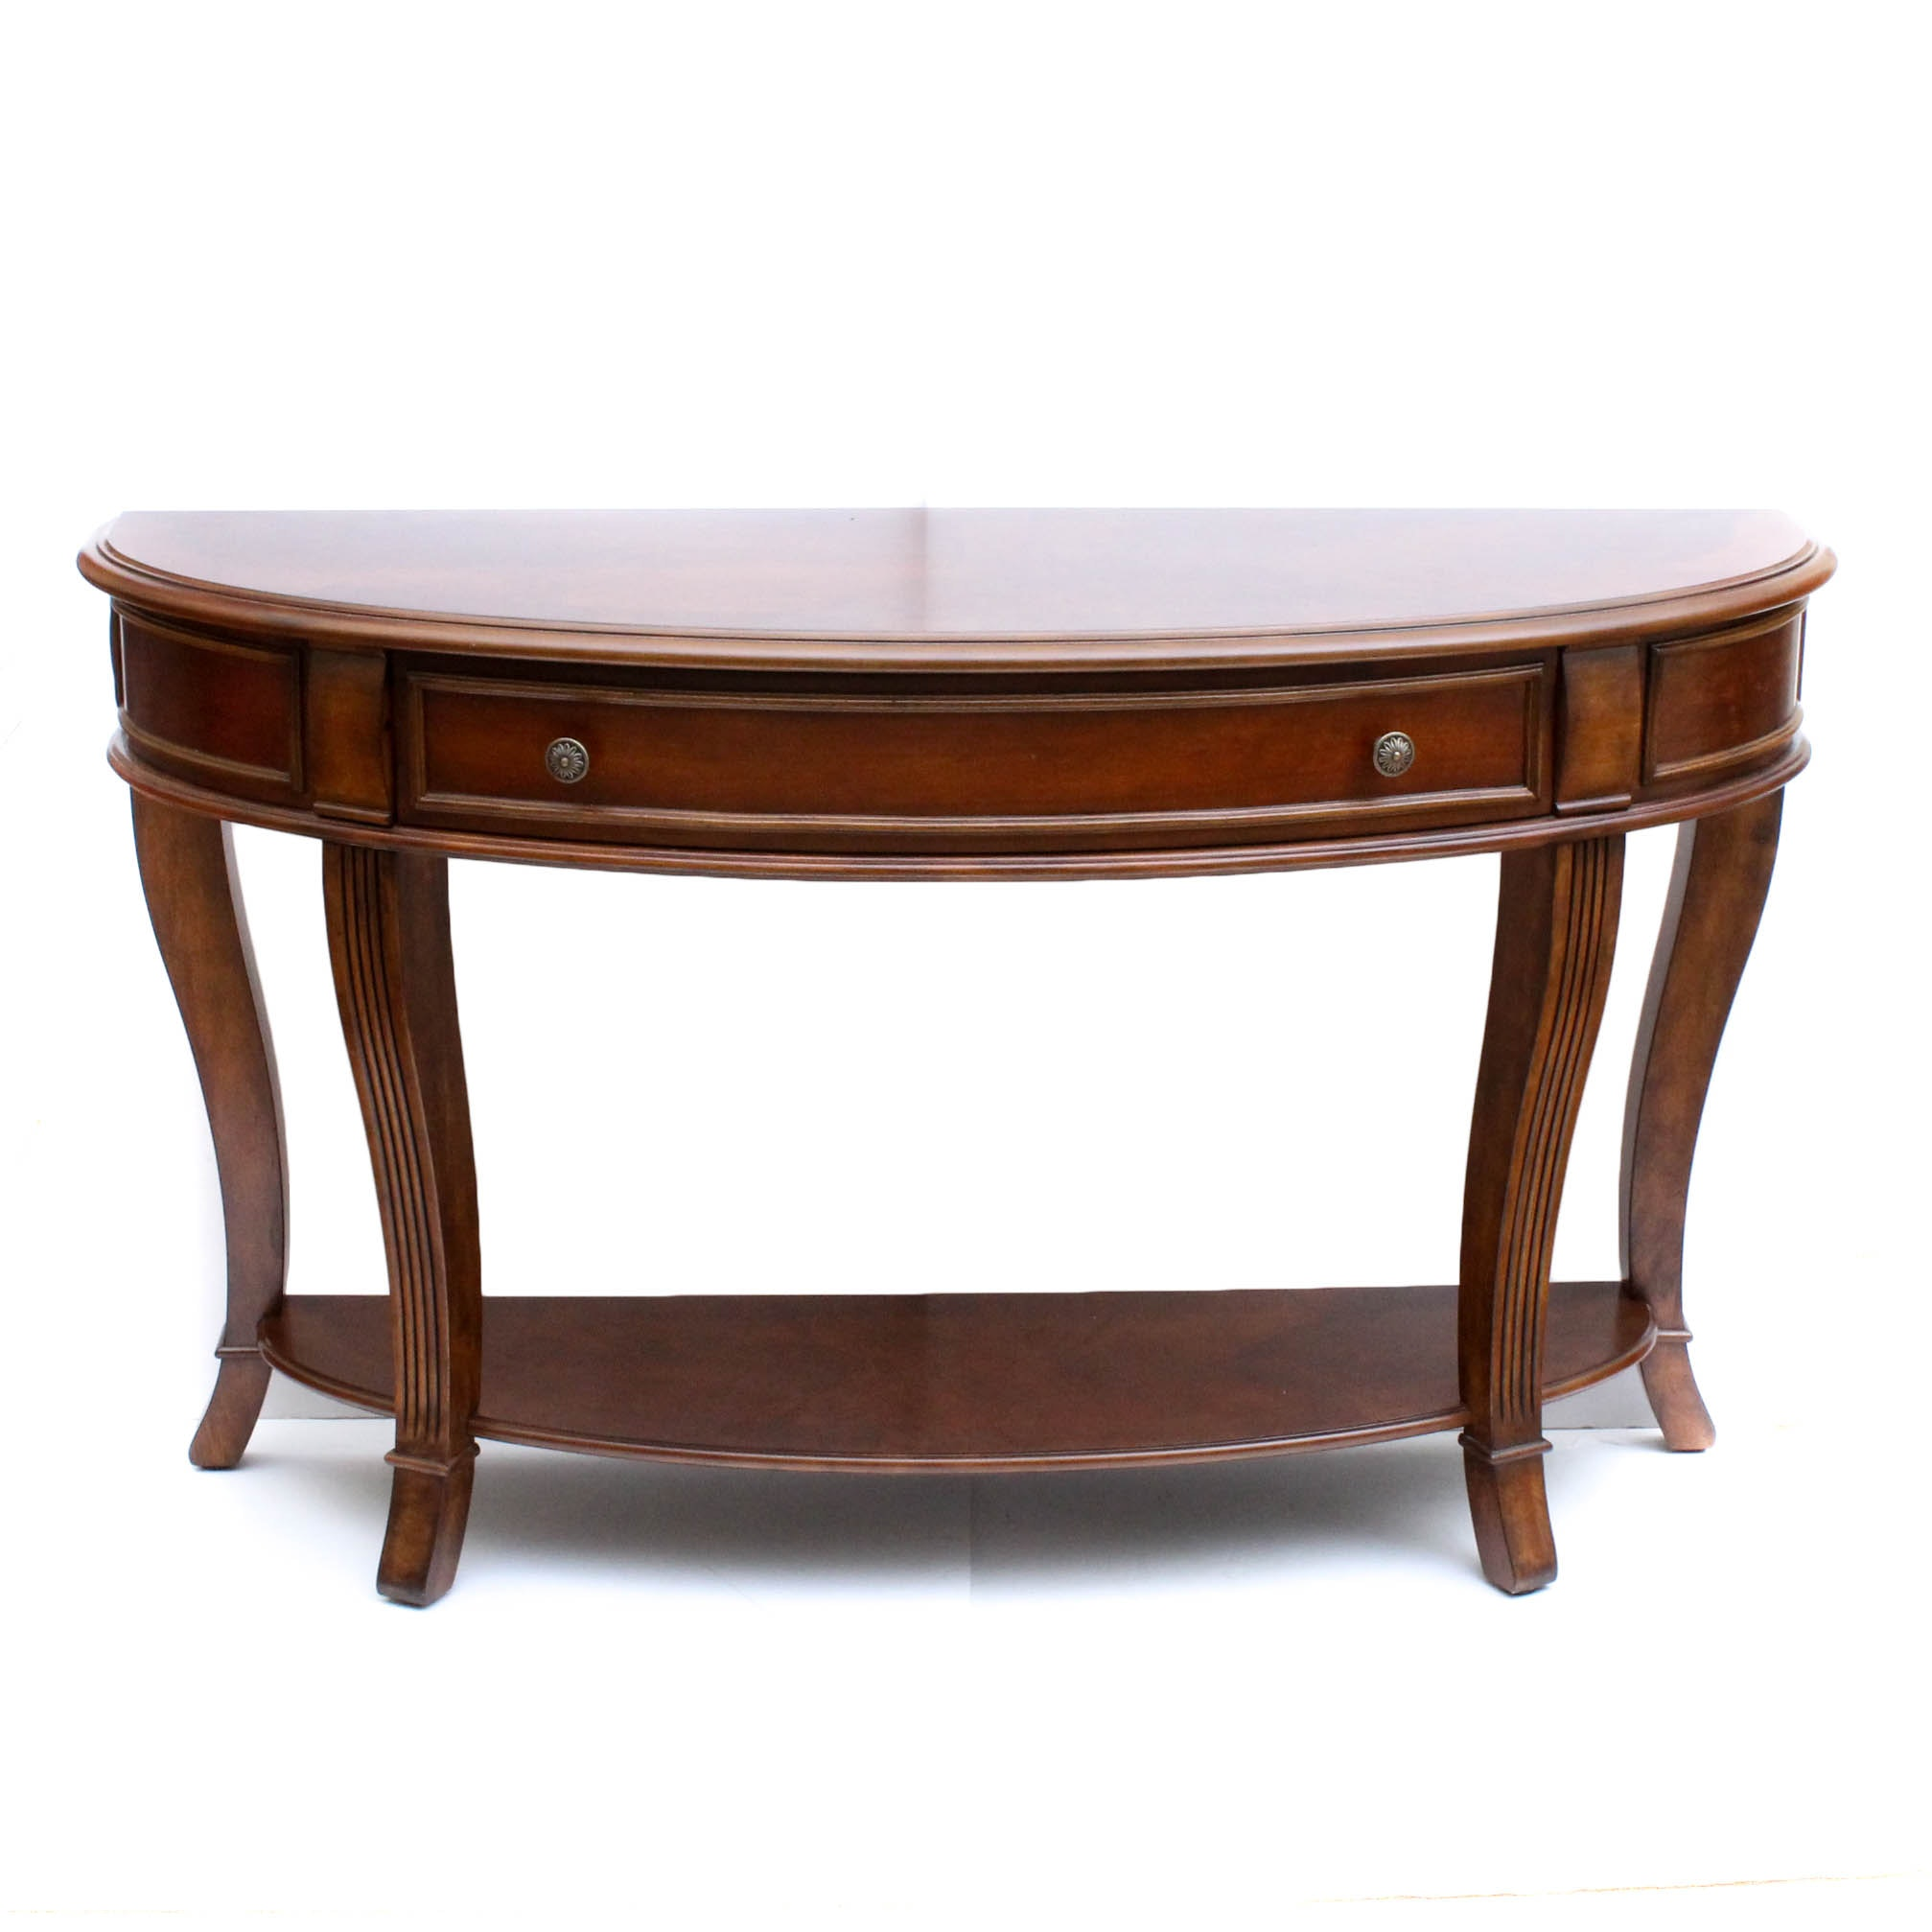 Hooker Furniture Cherry Veneer Hall Table